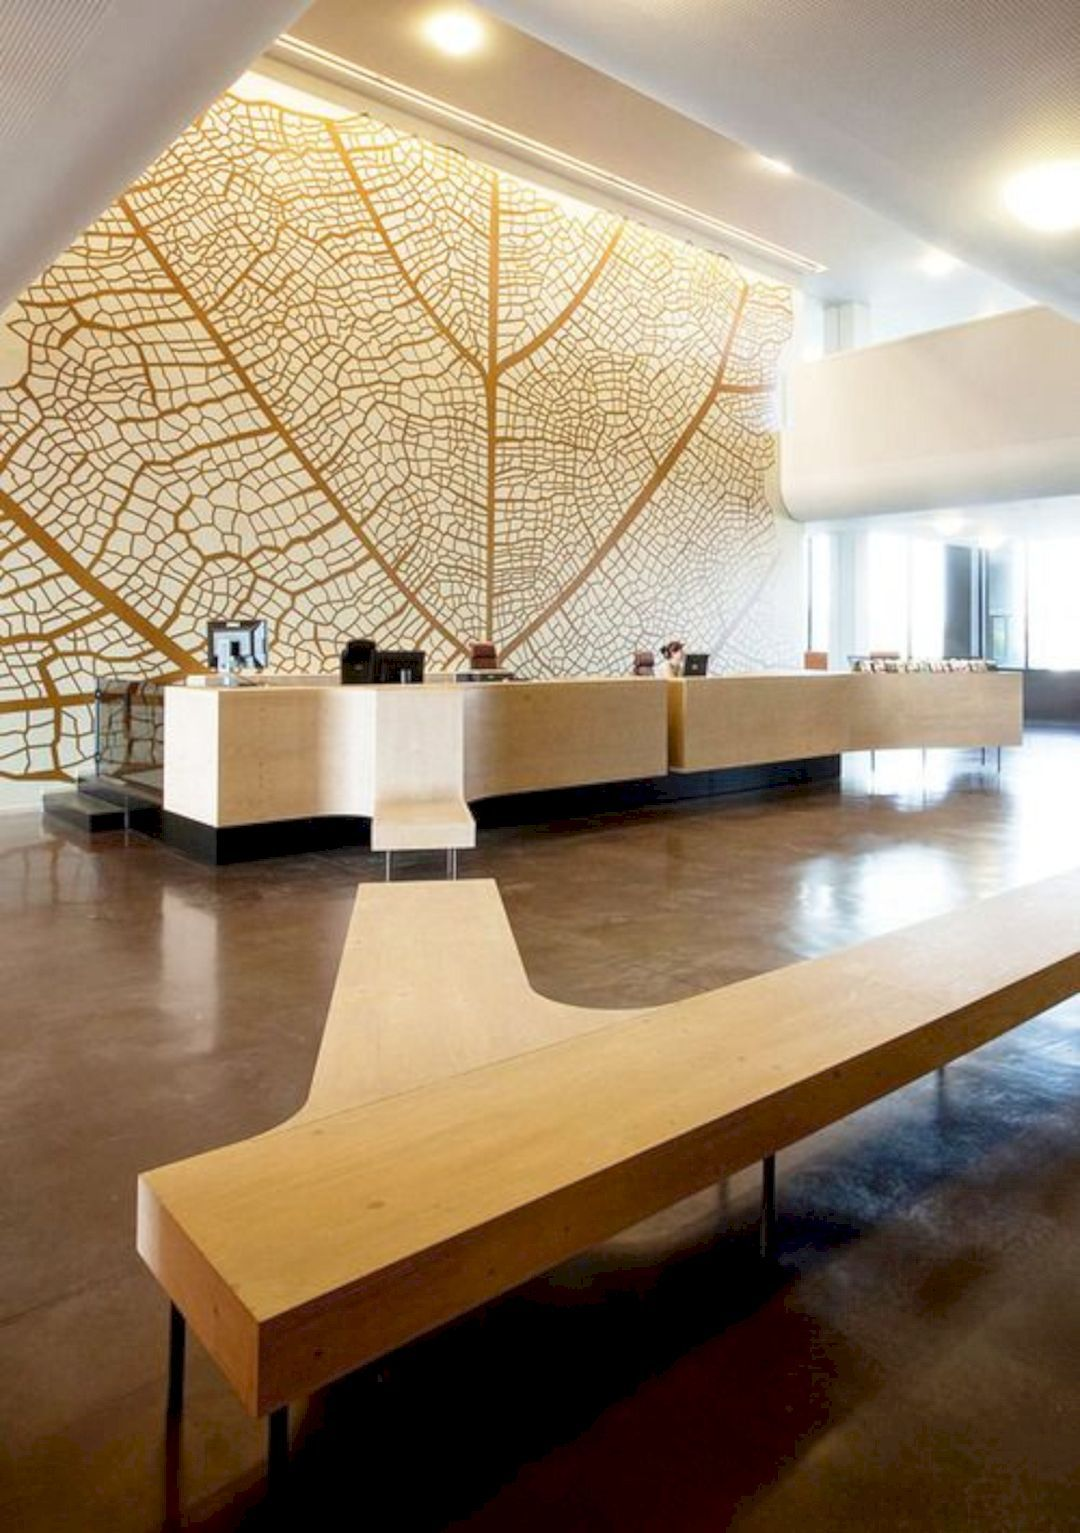 17 impressive interior design ideas for lobby gorgeous interior